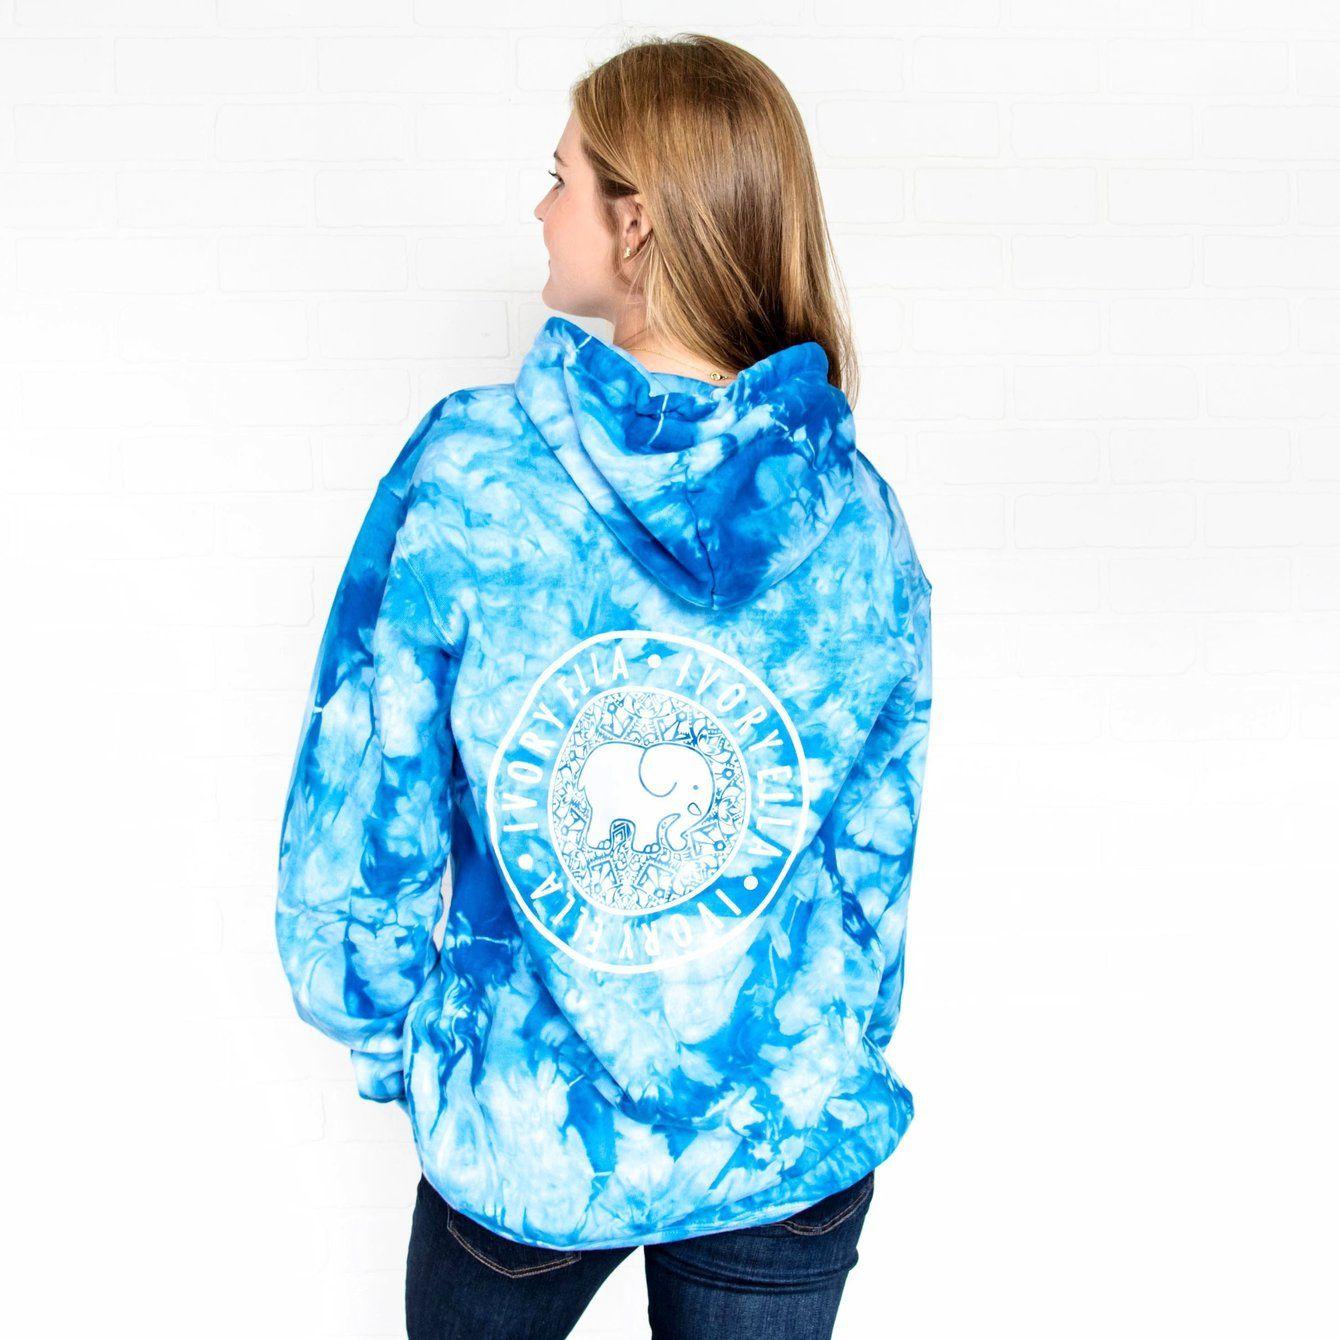 Oversized Royal Blue Tie Dye Hoodie Tie Dye Hoodie Tie Dye Techniques Tie Dye Sweatshirt [ 1340 x 1340 Pixel ]